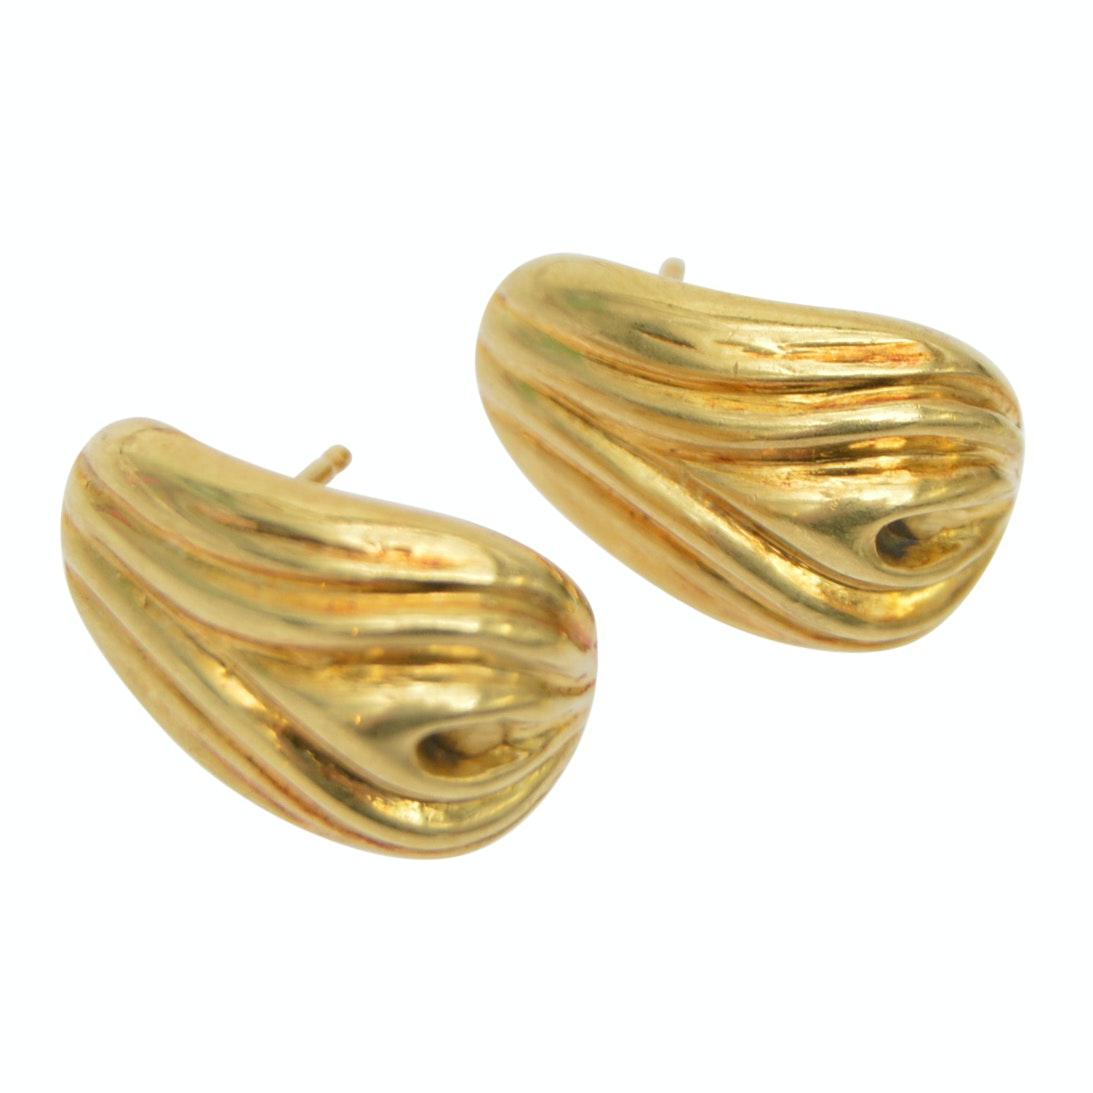 18K Yellow Gold Ribbed Pierced Earrings